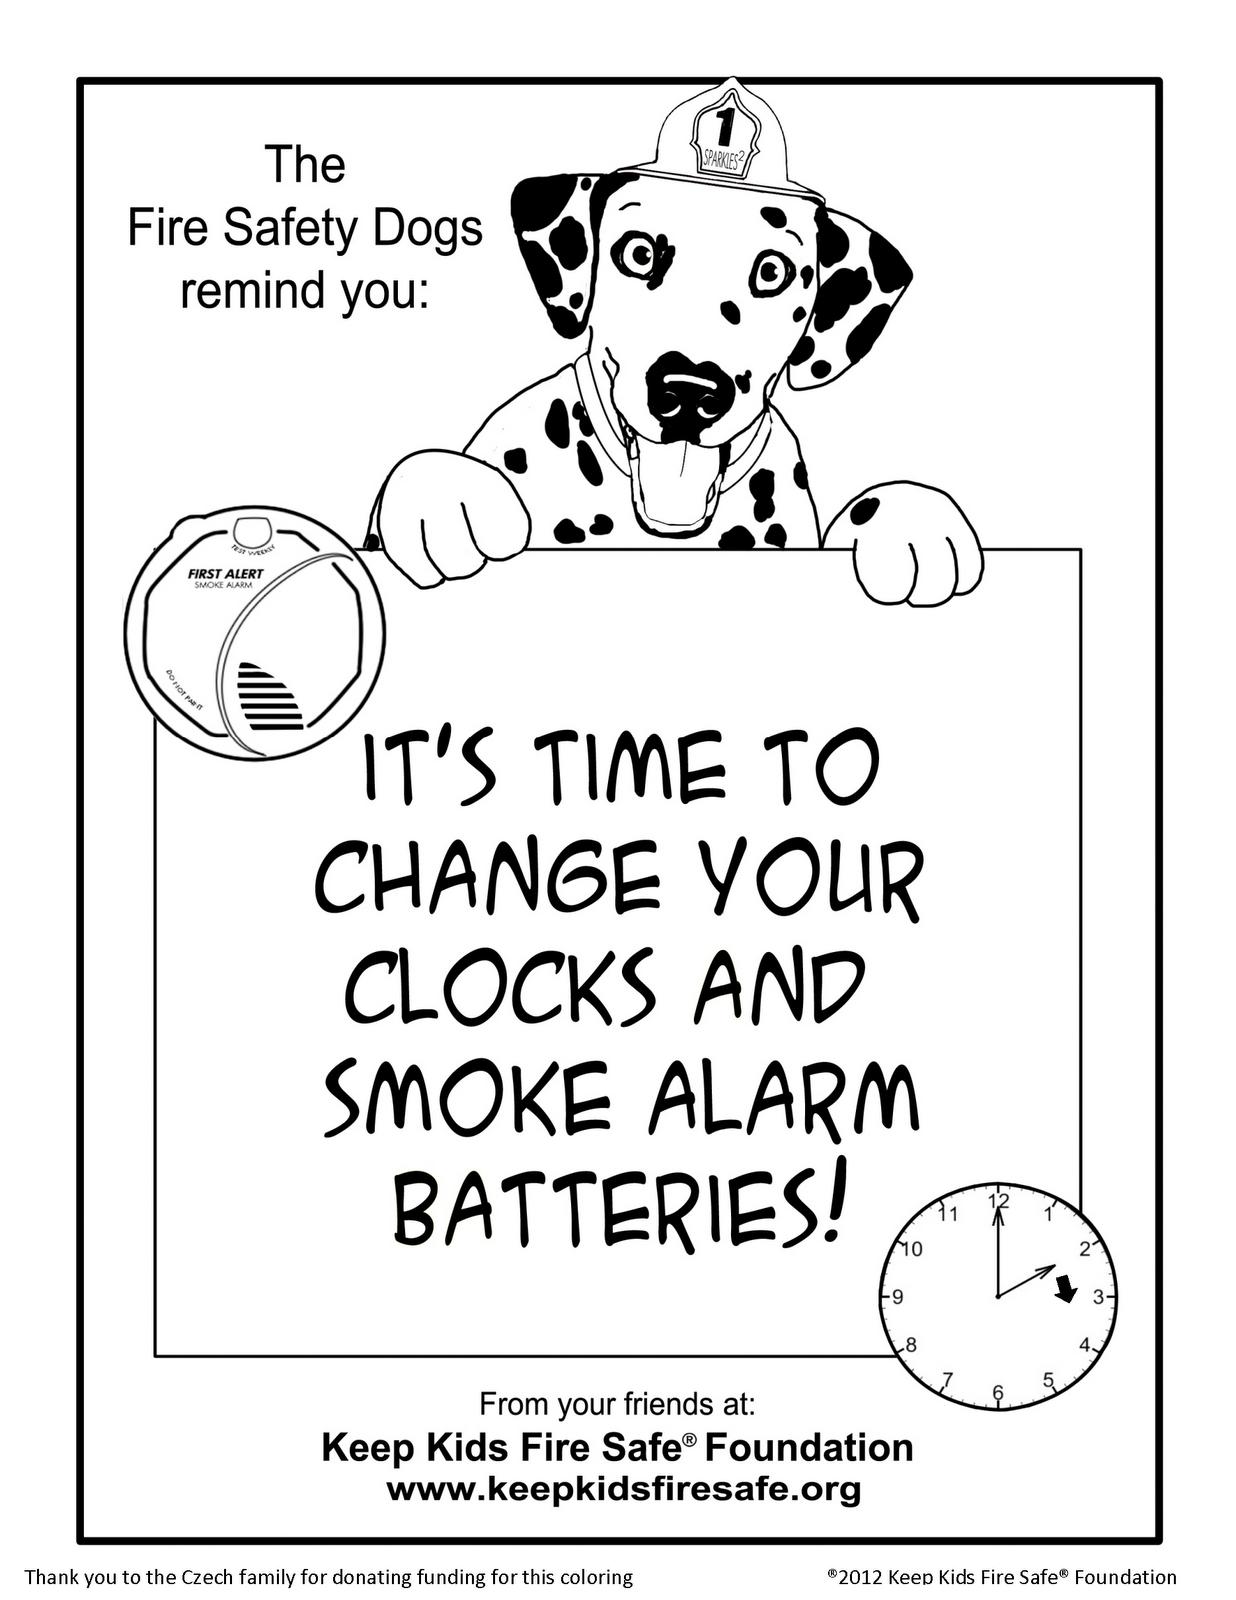 Fire Safety Rocks: March 2012